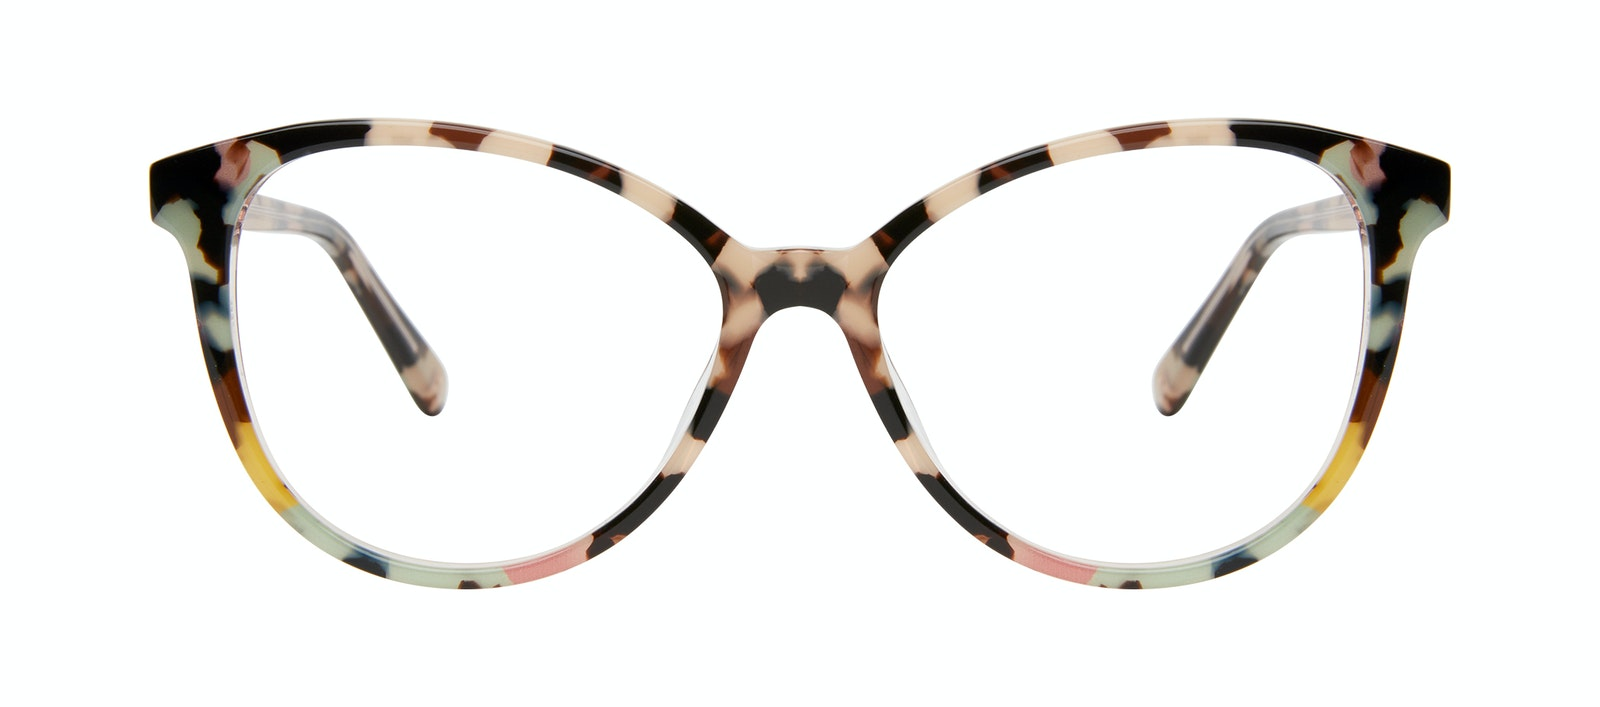 Affordable Fashion Glasses Cat Eye Eyeglasses Women Esprit Pastel Tort Front